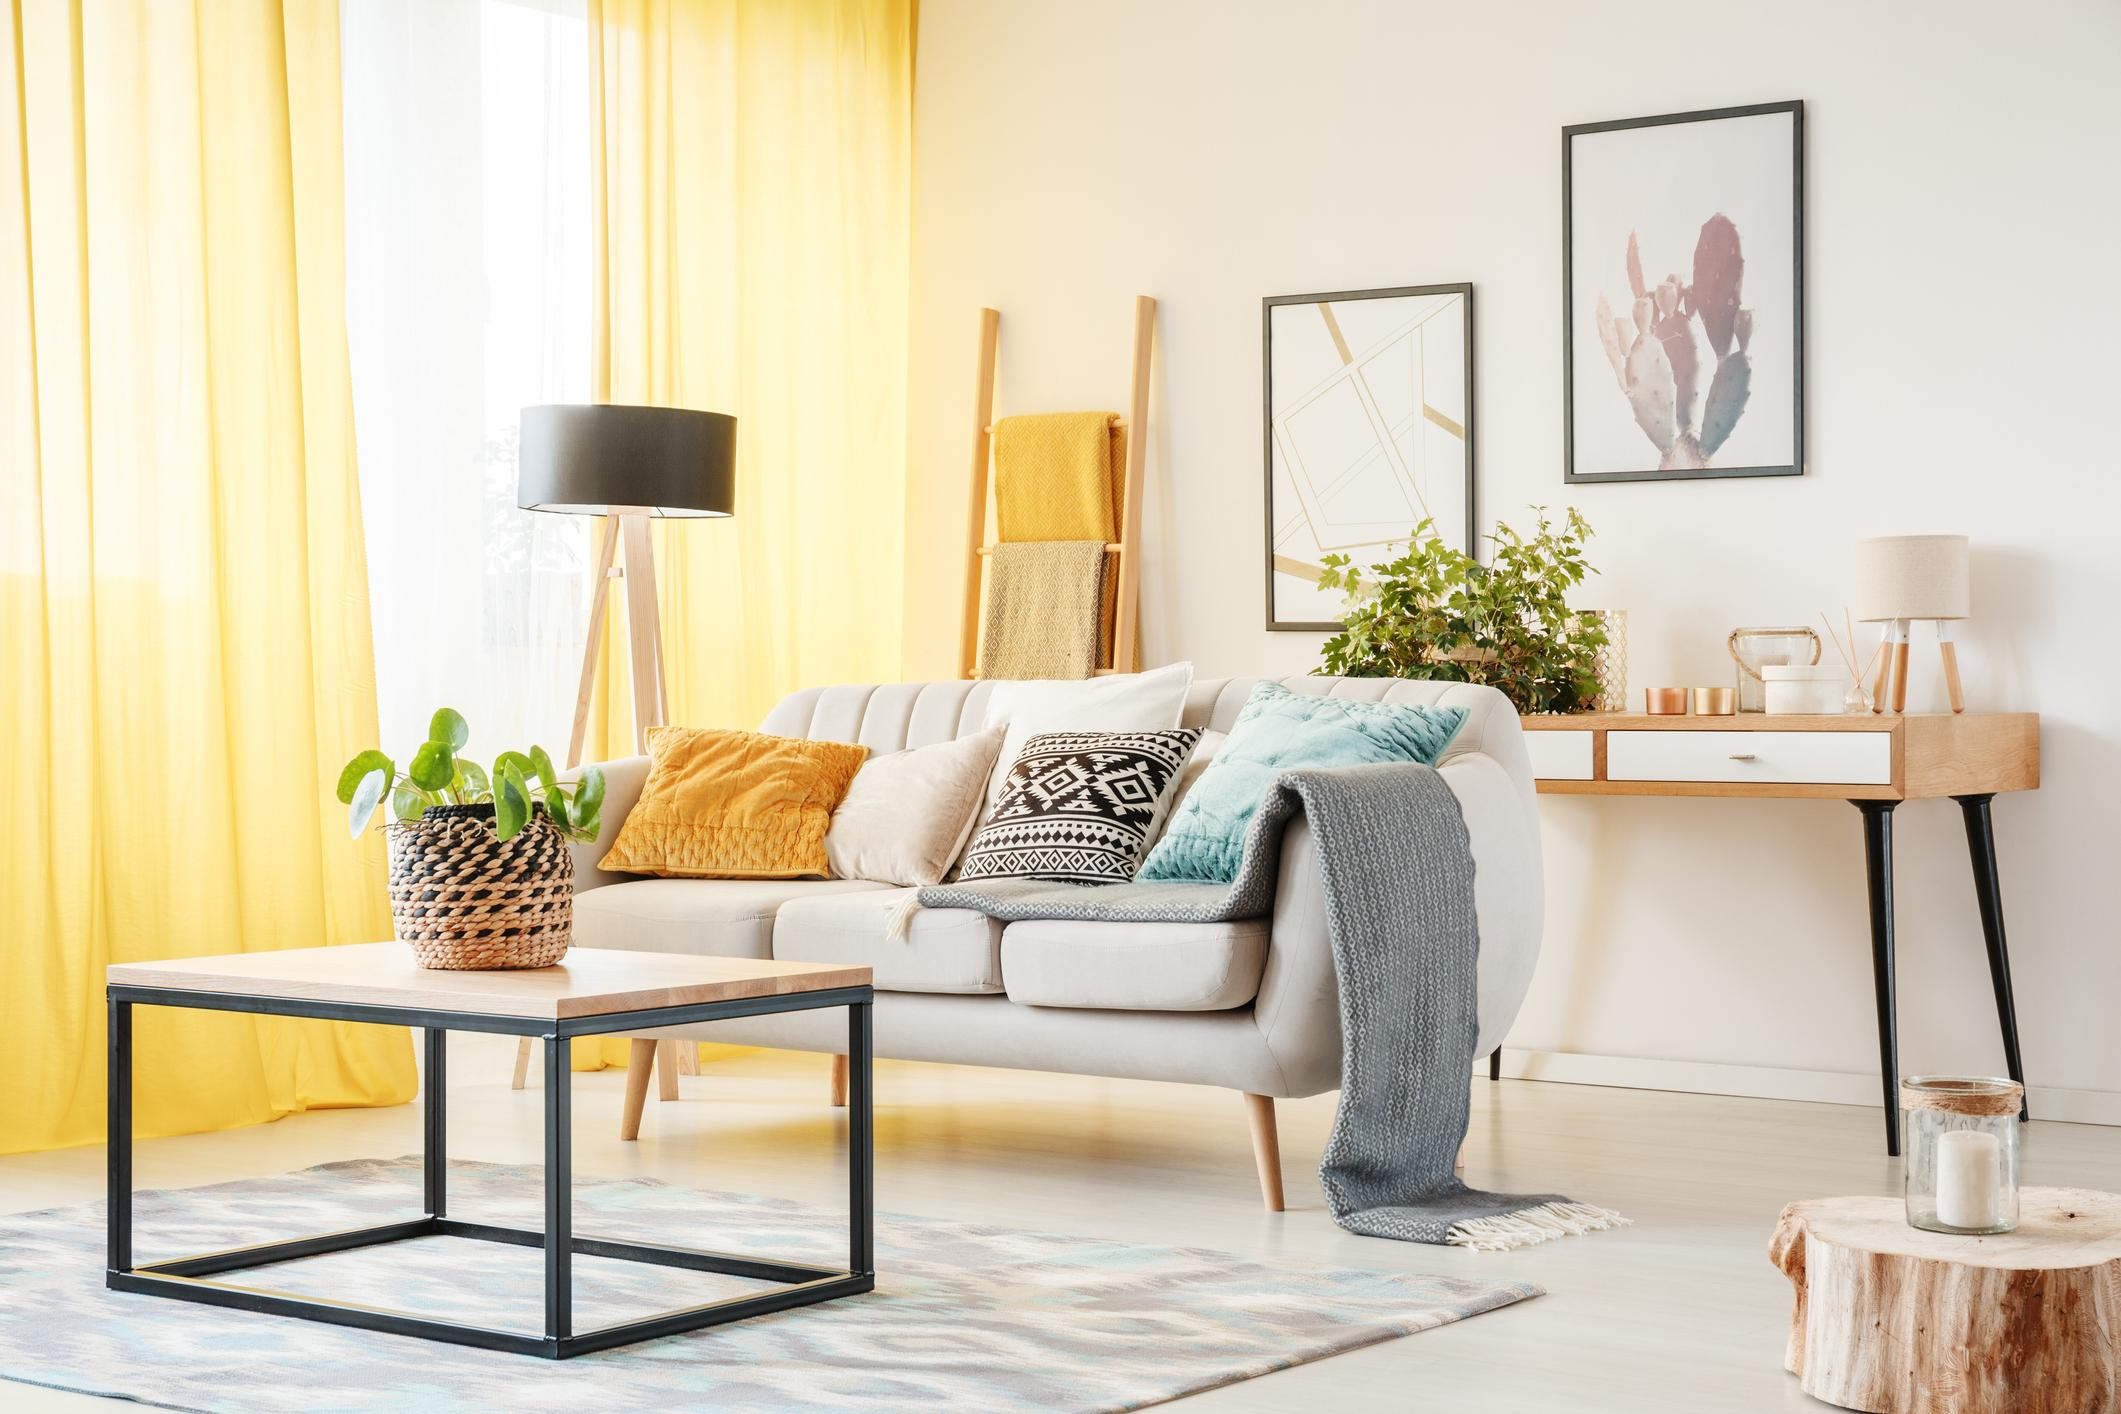 iStock-KatarzynaBialasiewicz Plant in warm living room.jpg